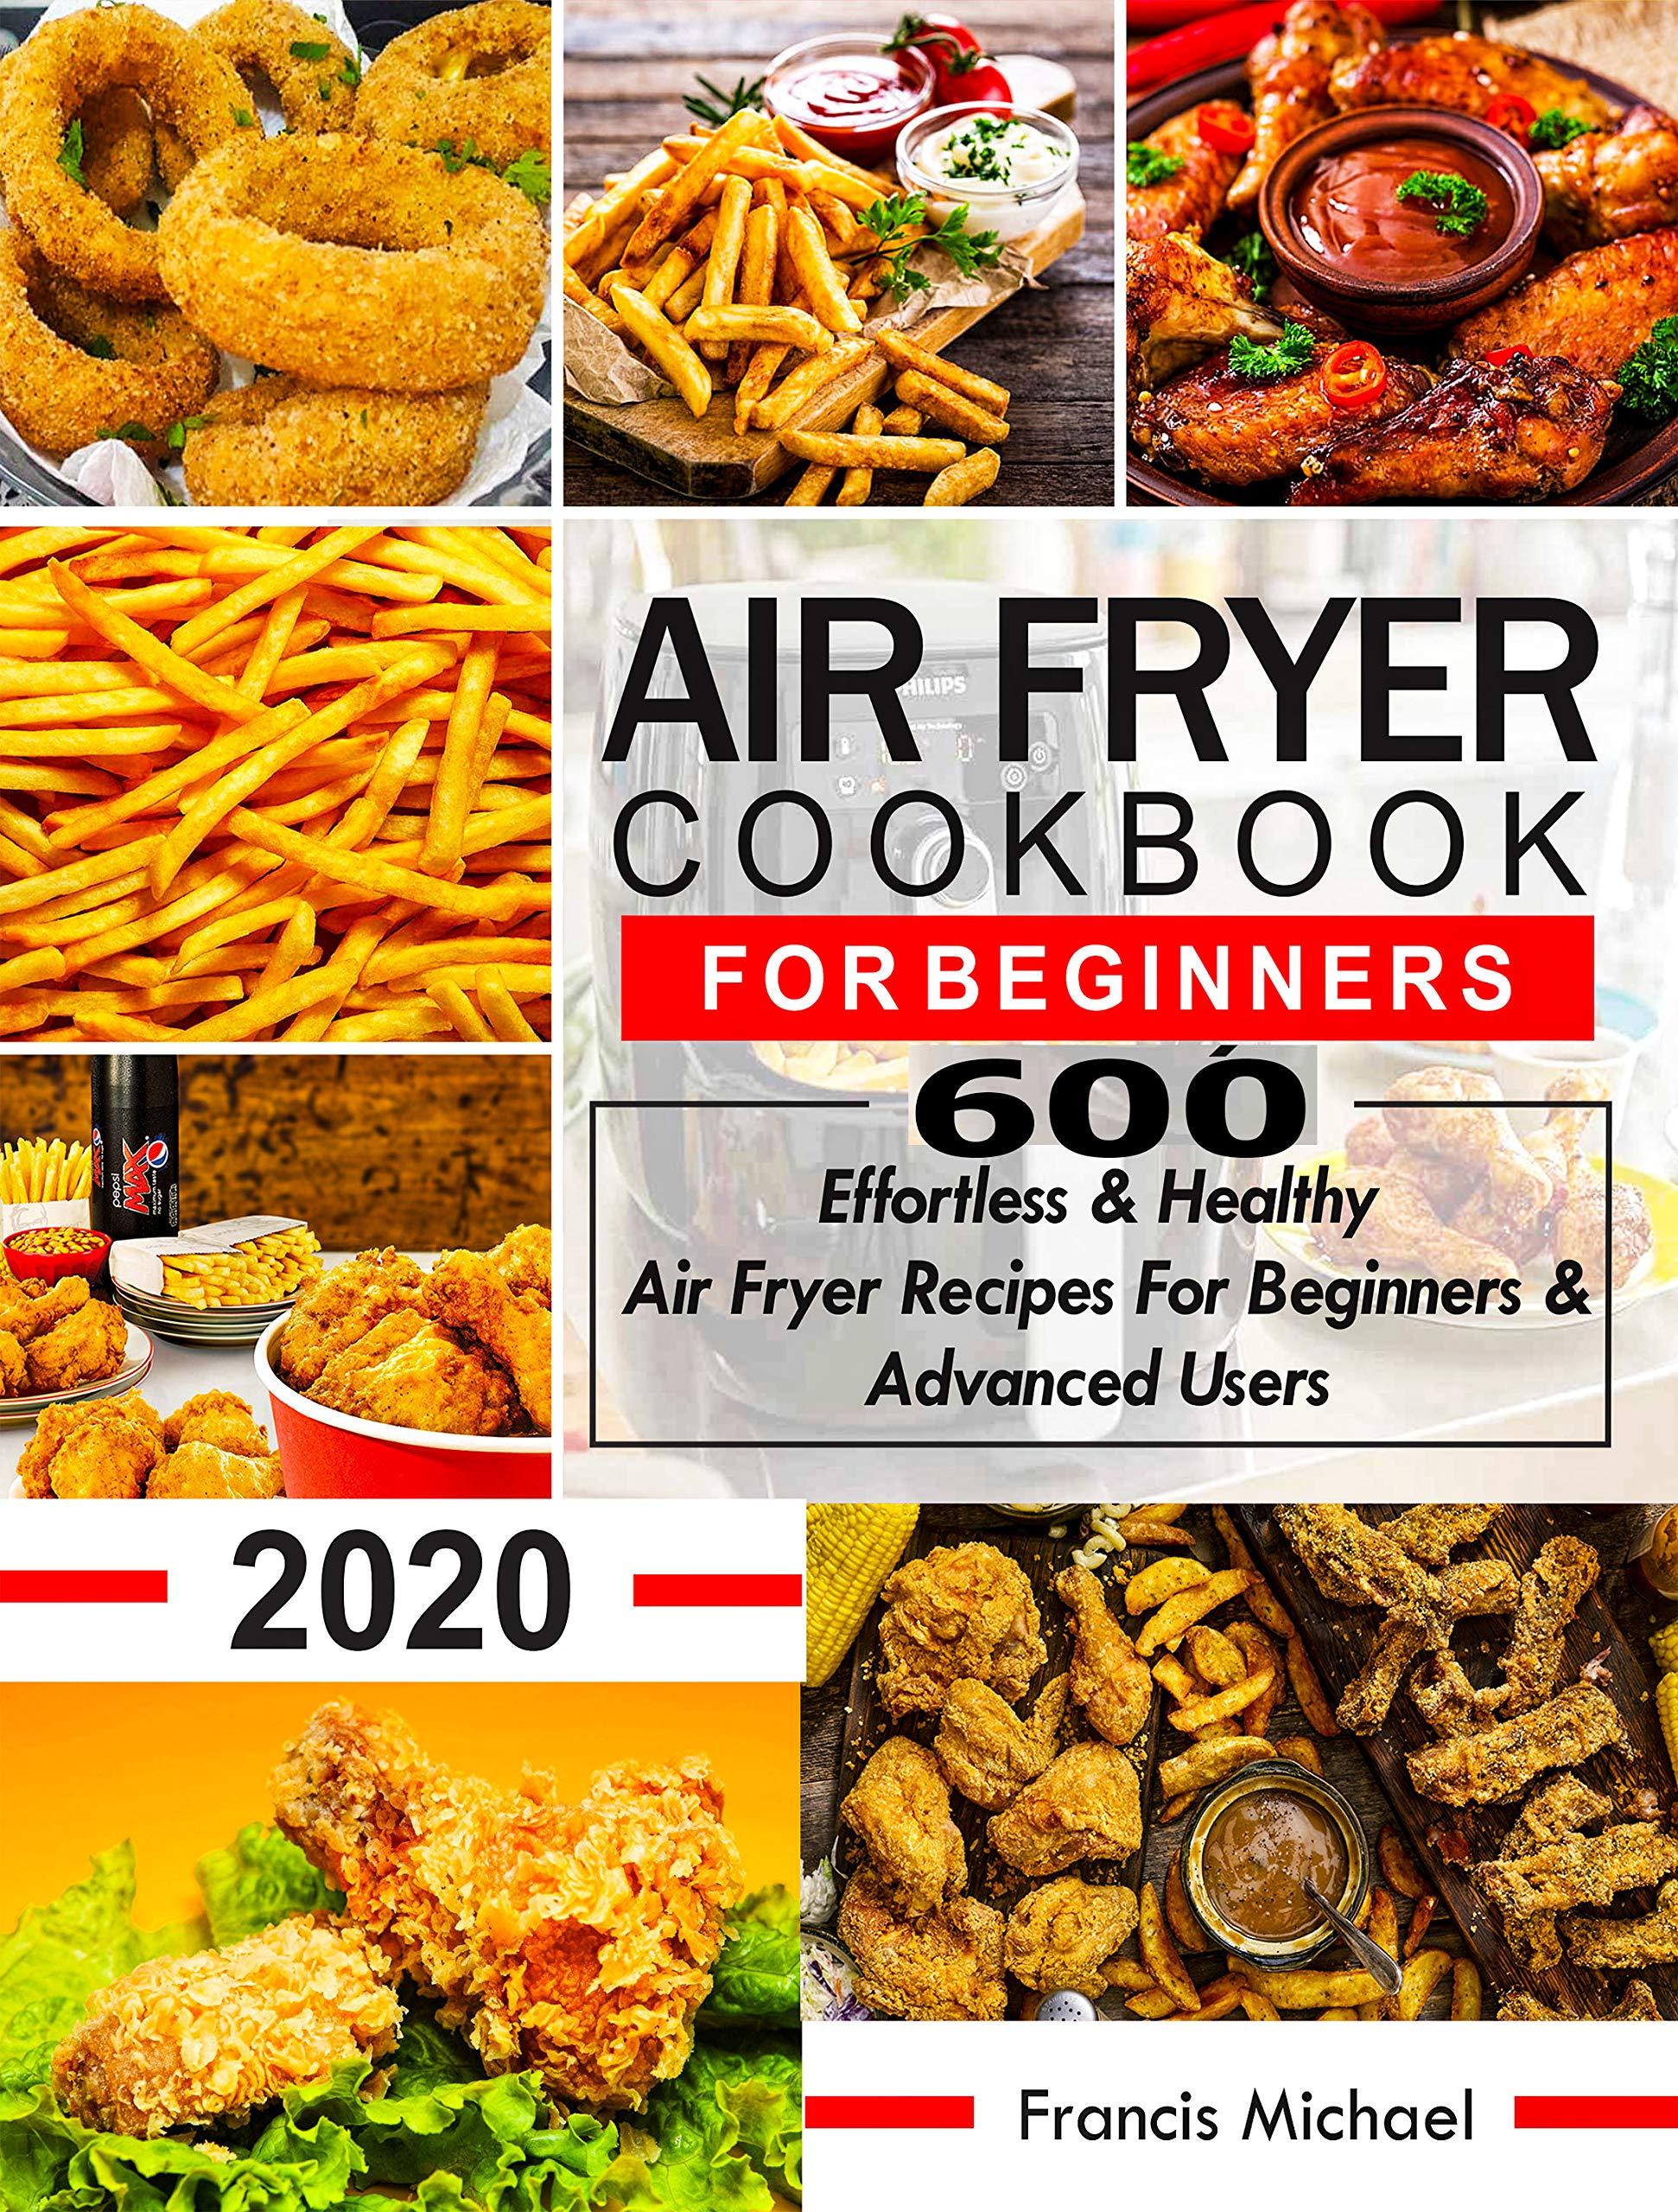 AIR FRYER COOKBOOK FOR BEGINNERS: 600 Effortless & Healthy Air Fryer Recipes for Beginners & Advanced Users